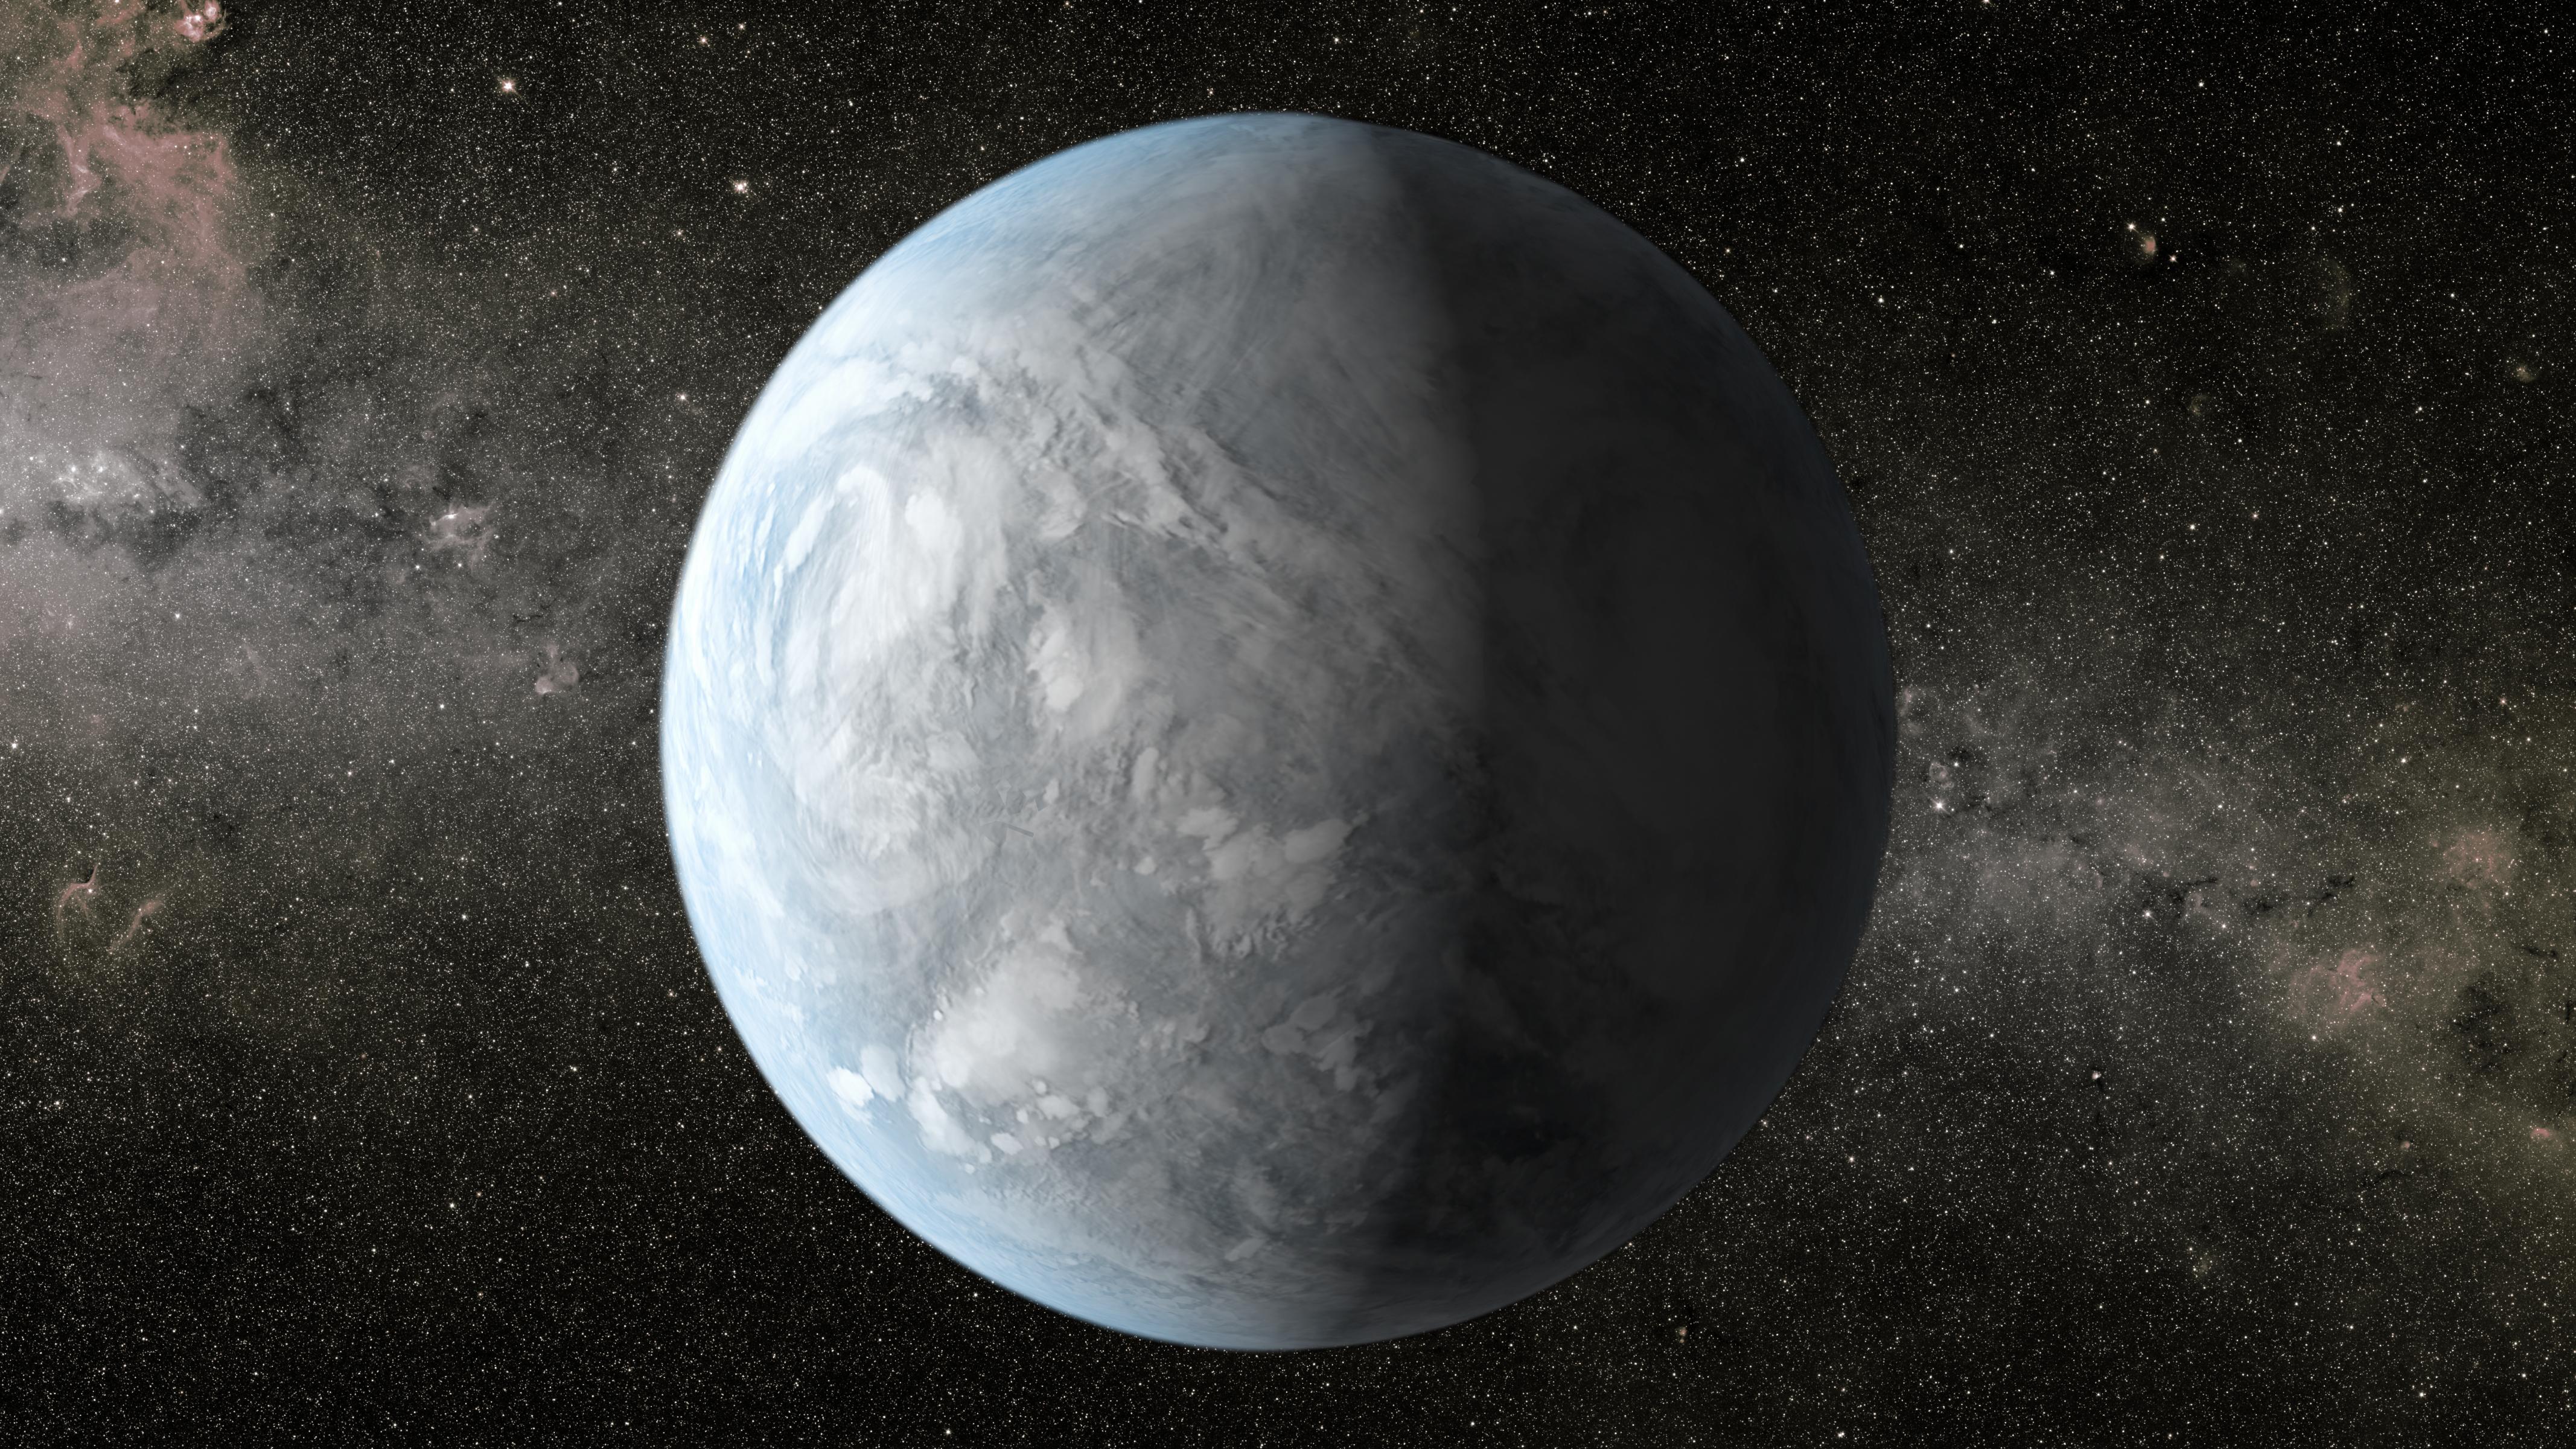 Artist's impression of Kepler-62e